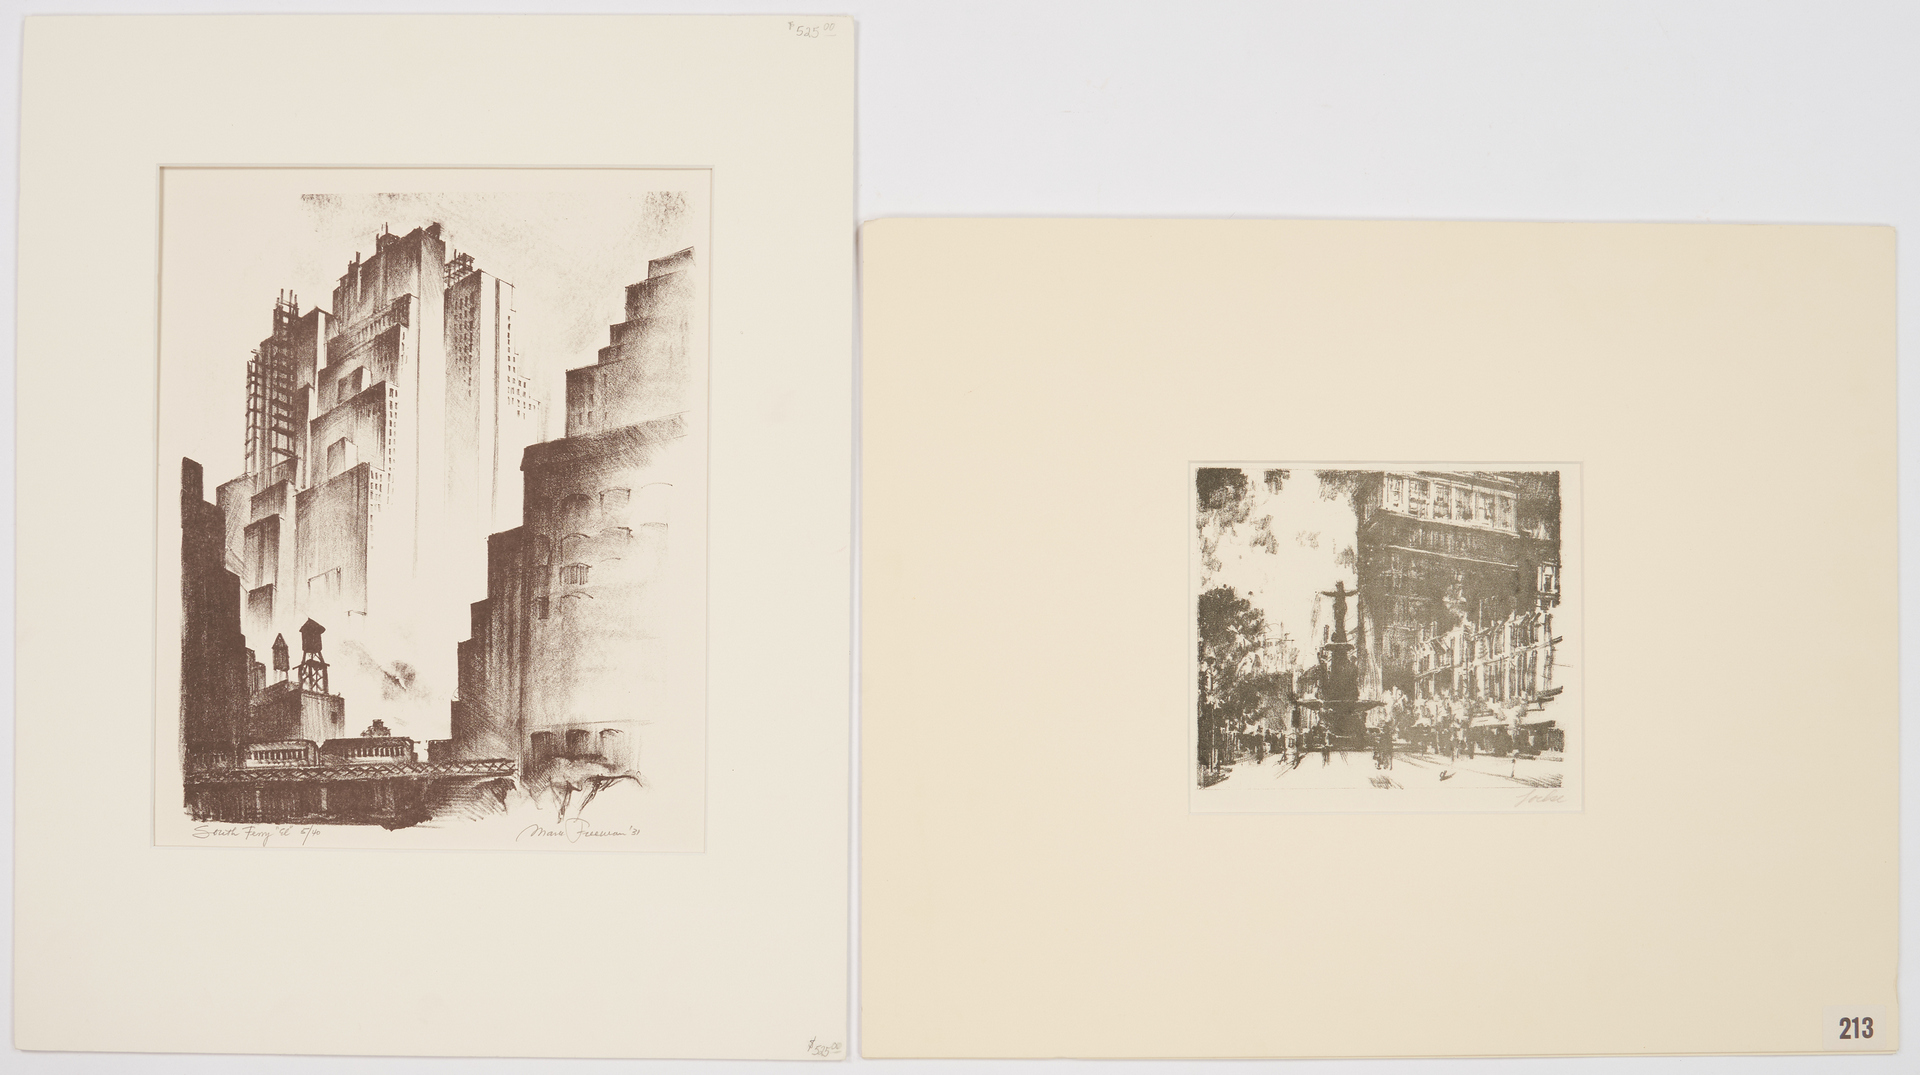 Lot 811: 2 City Lithographs, Mark Freeman & Lochse